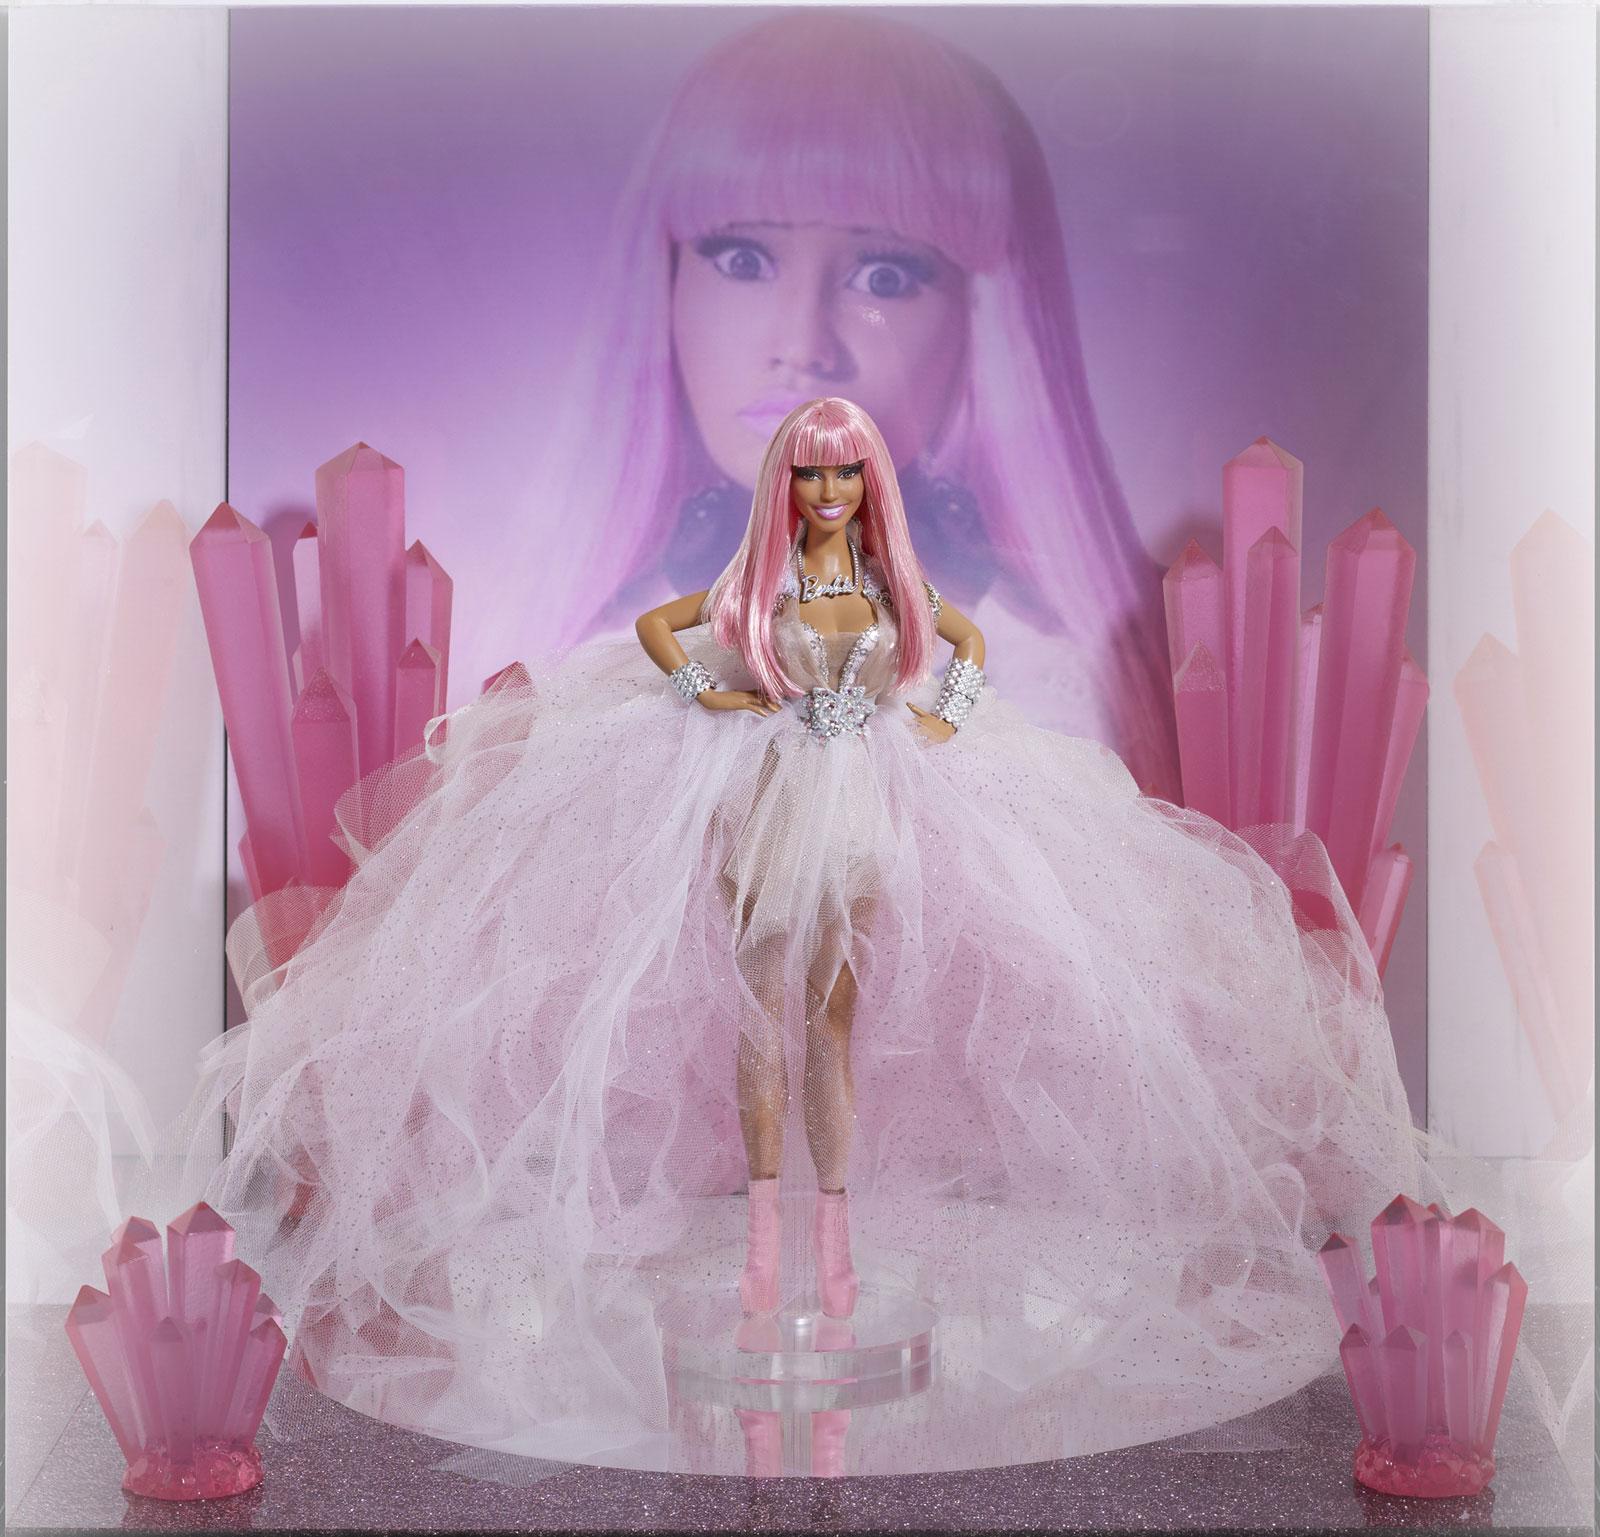 Nicki Minaj And Katy Perry Barbie Doll Goes Under The